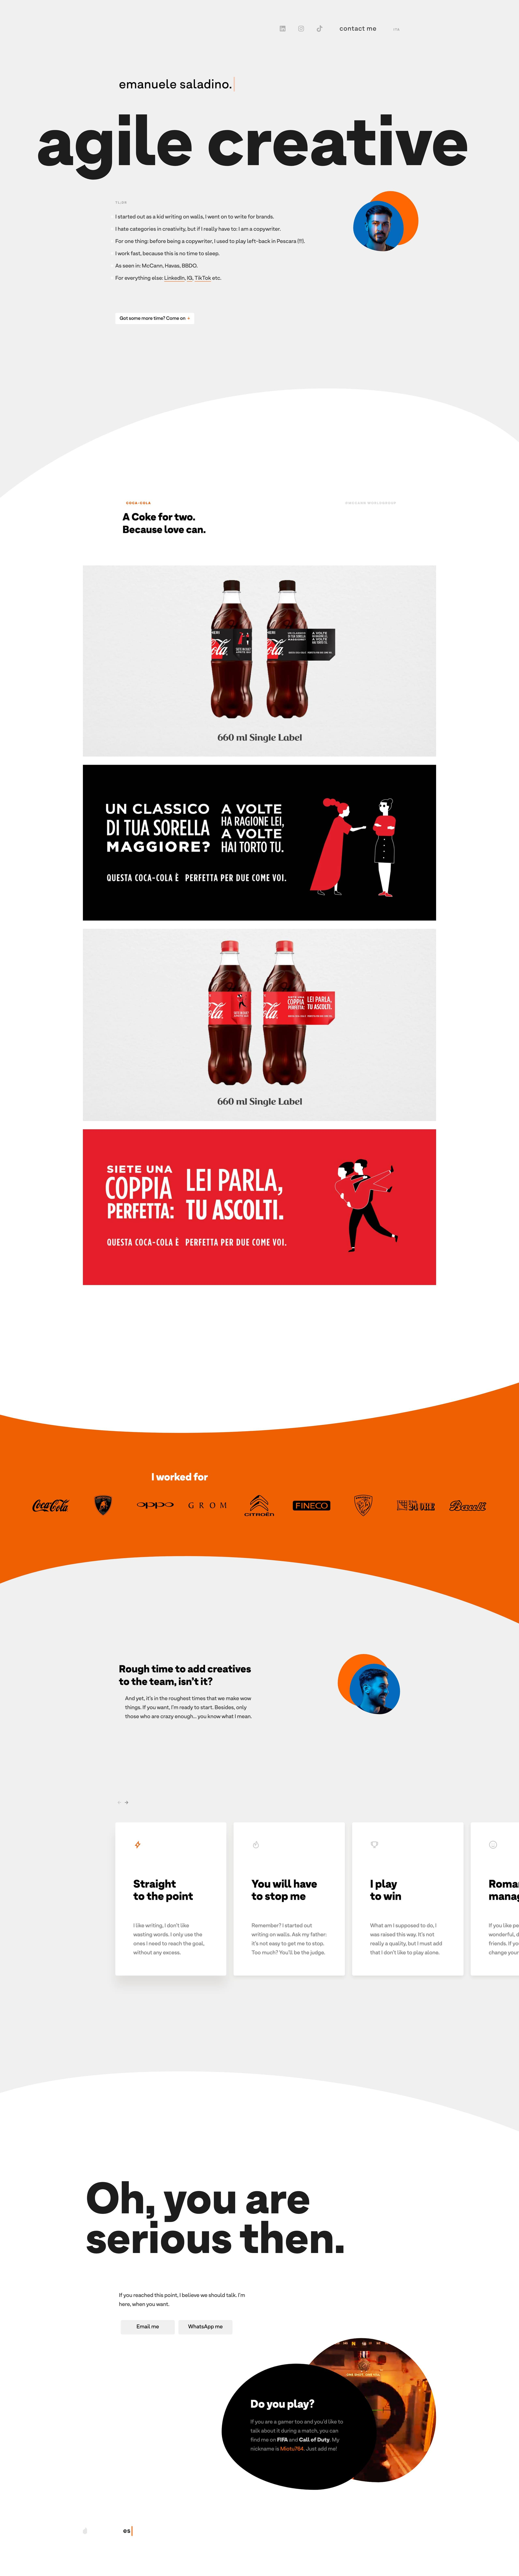 Emanuele Saladino Website Screenshot